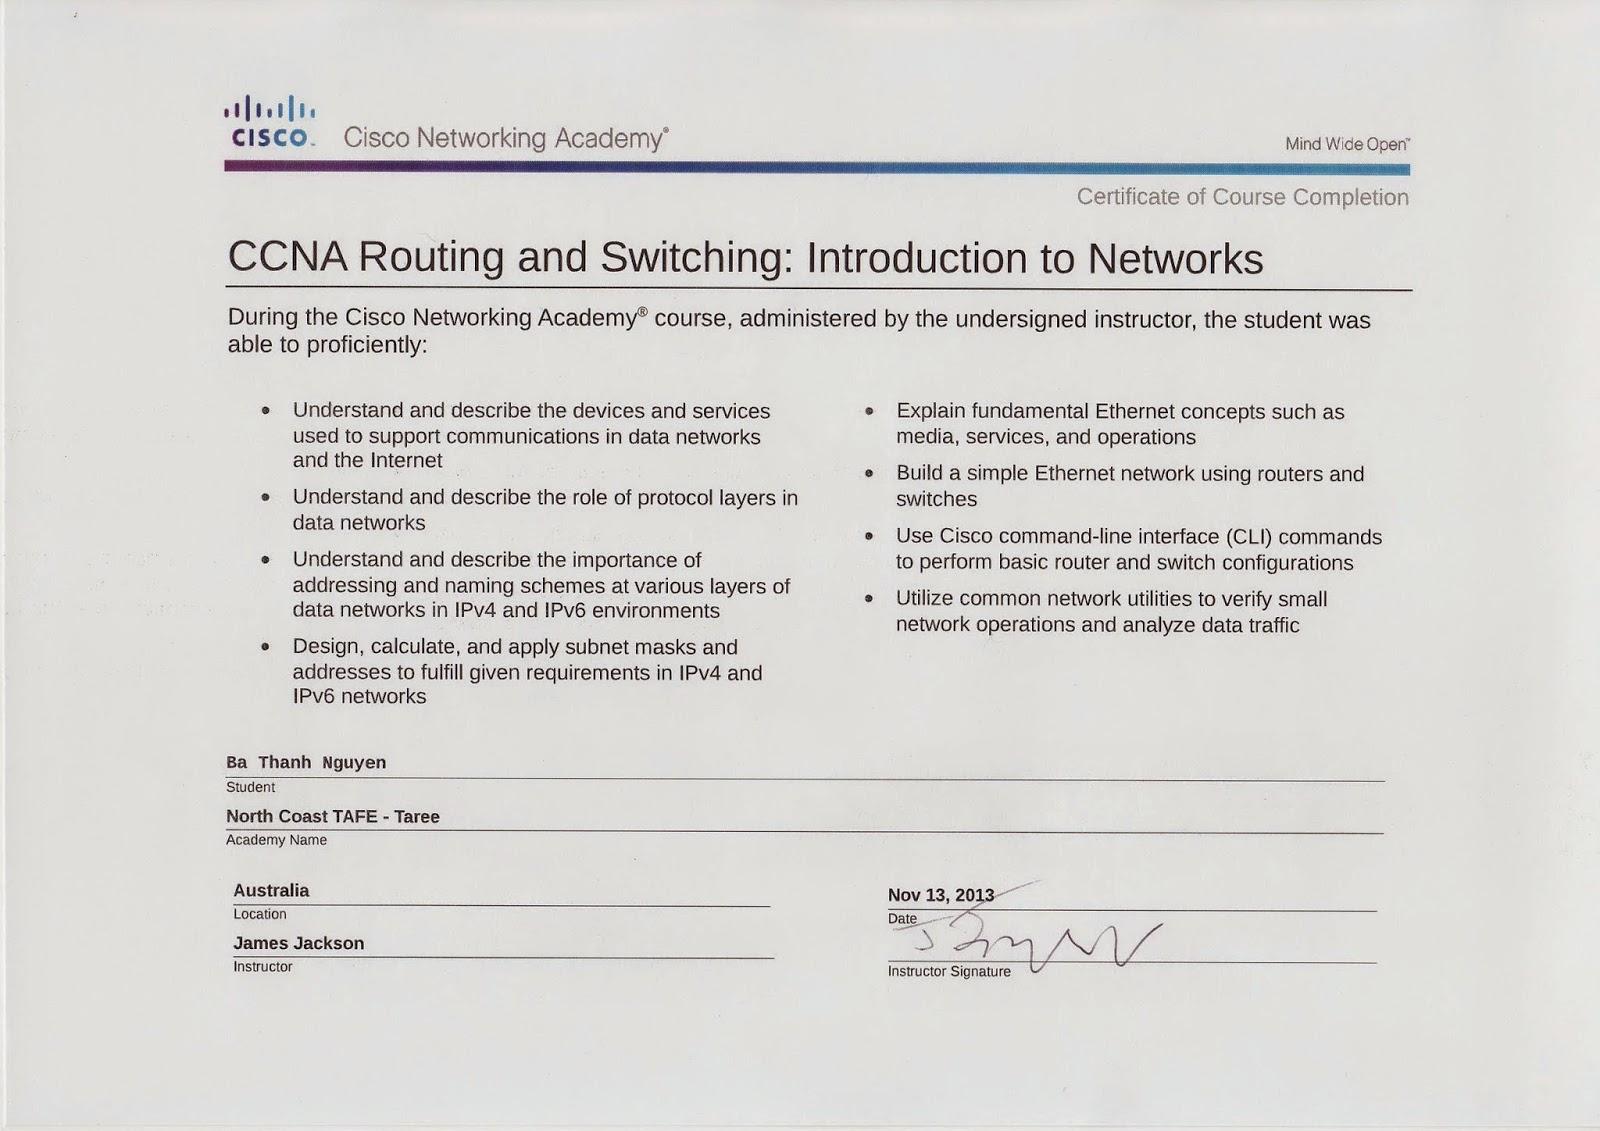 BaThanh\'s Tai chi: 4 Parts Cisco CCNA Certificate